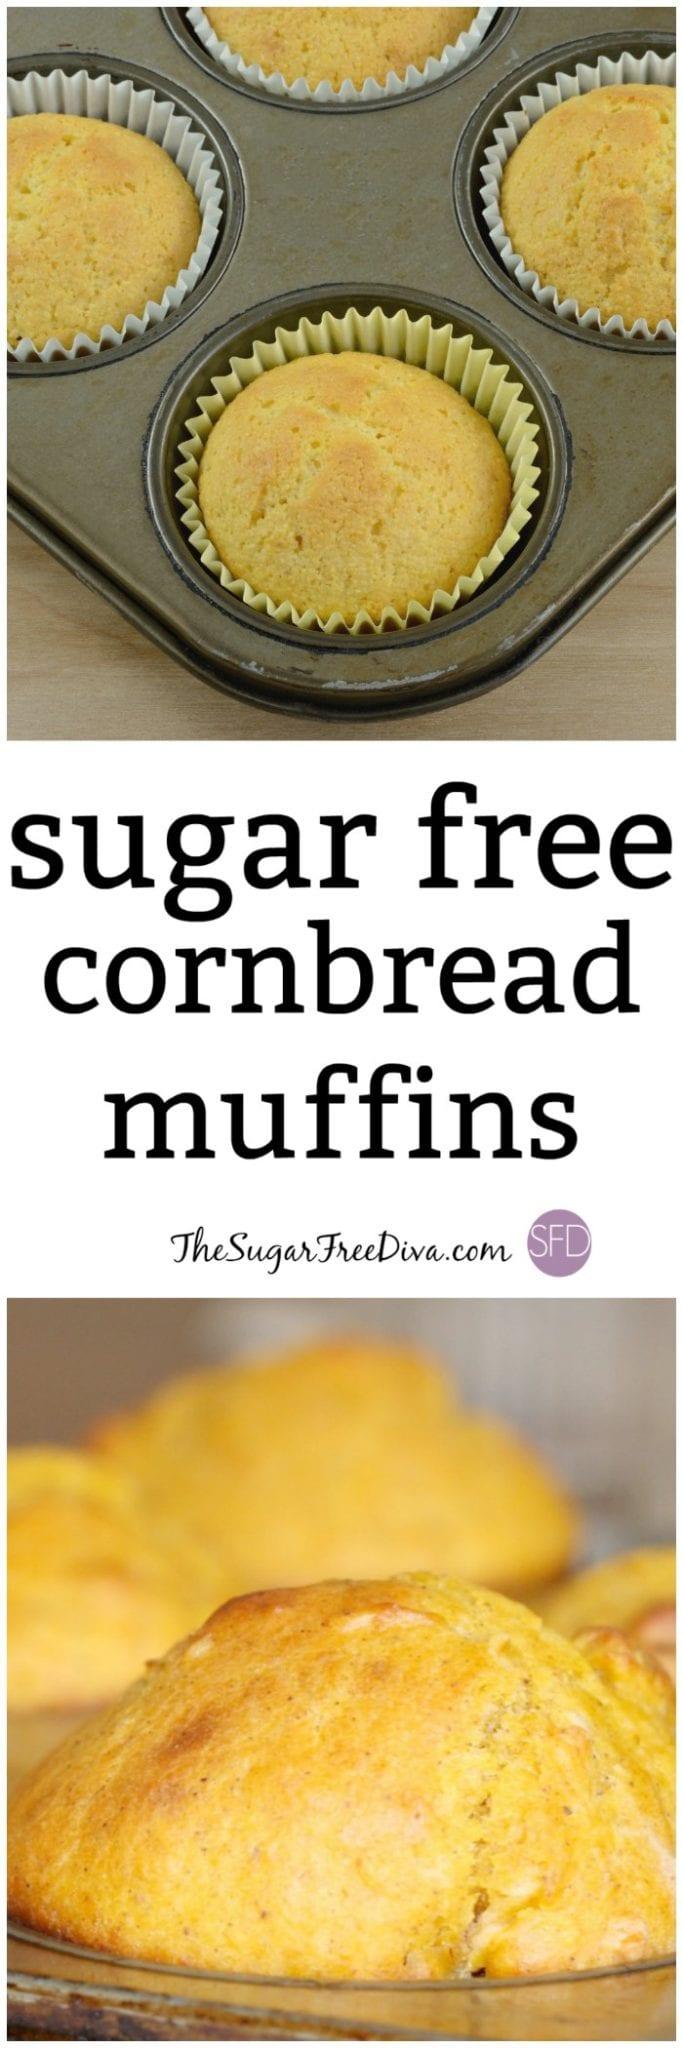 Sugar Free Cornbread Muffins